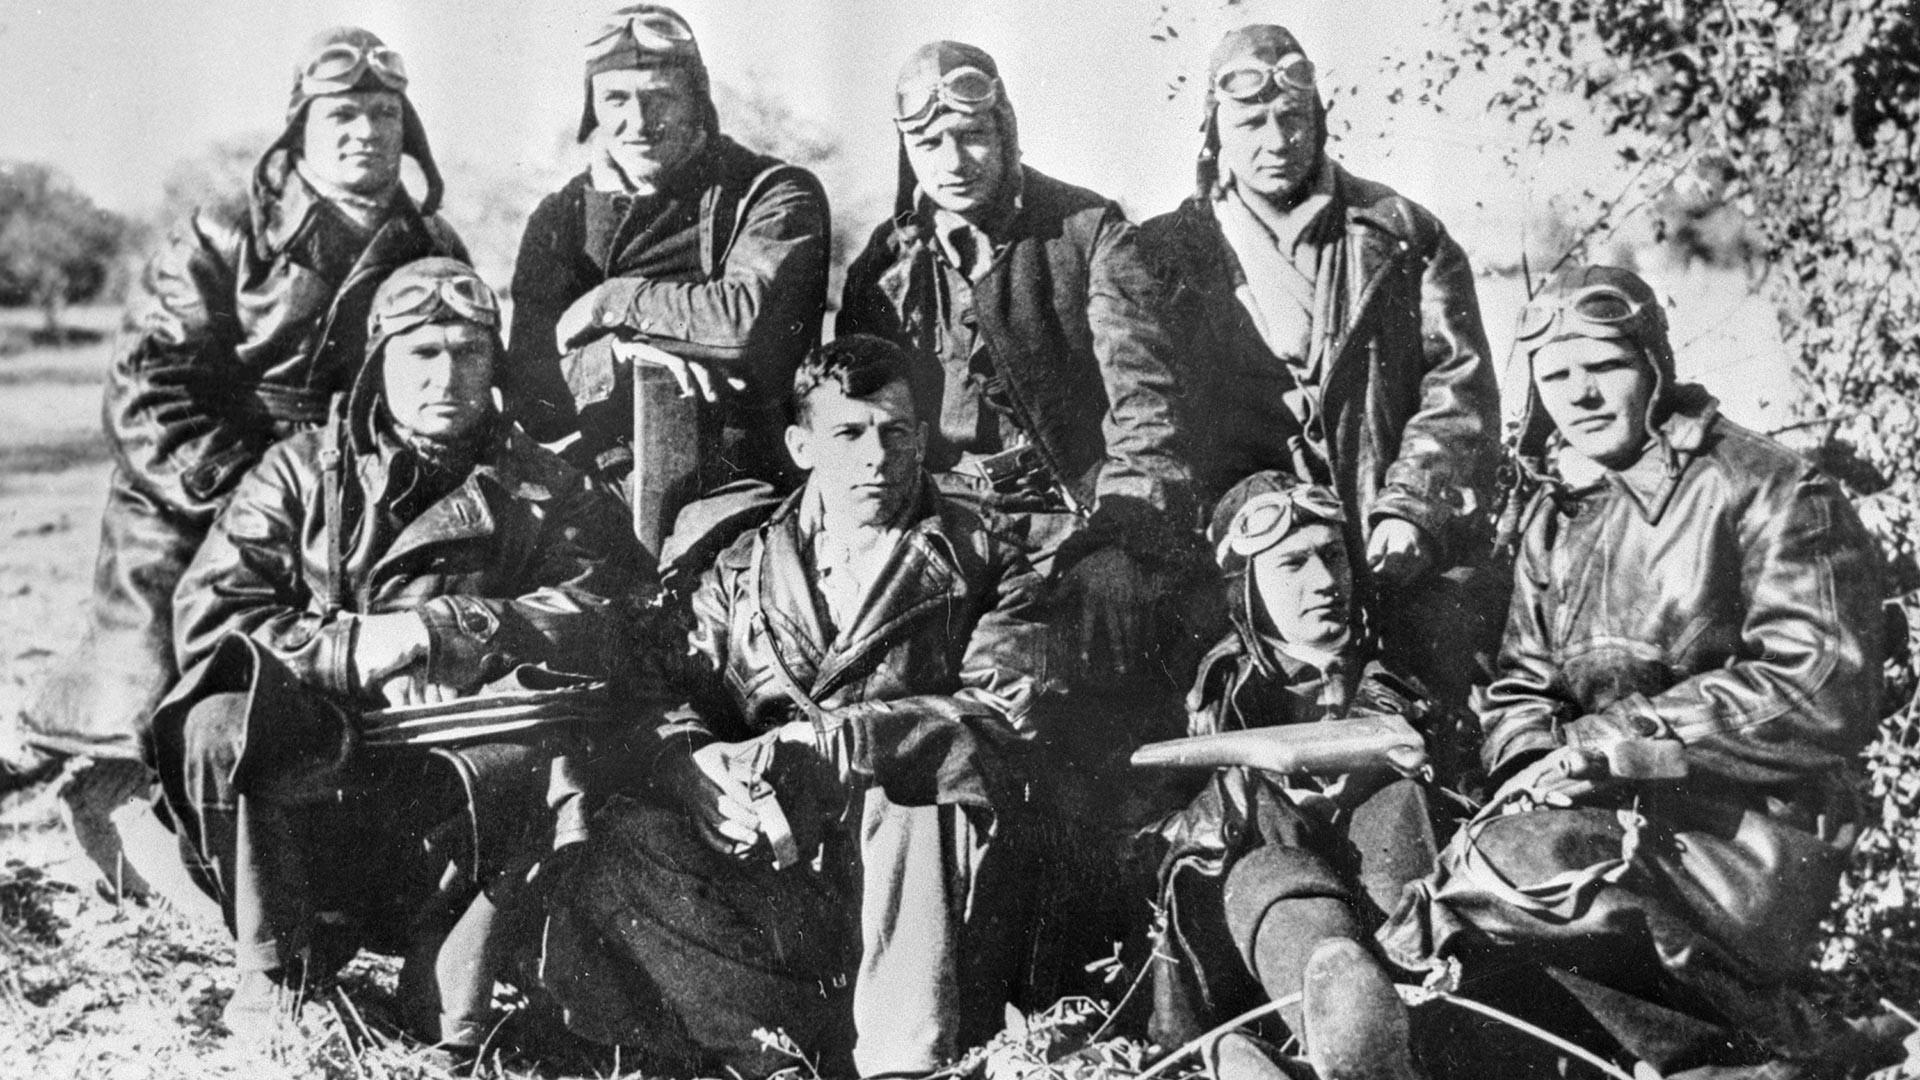 Piloti sovietici nei pressi di Madrid